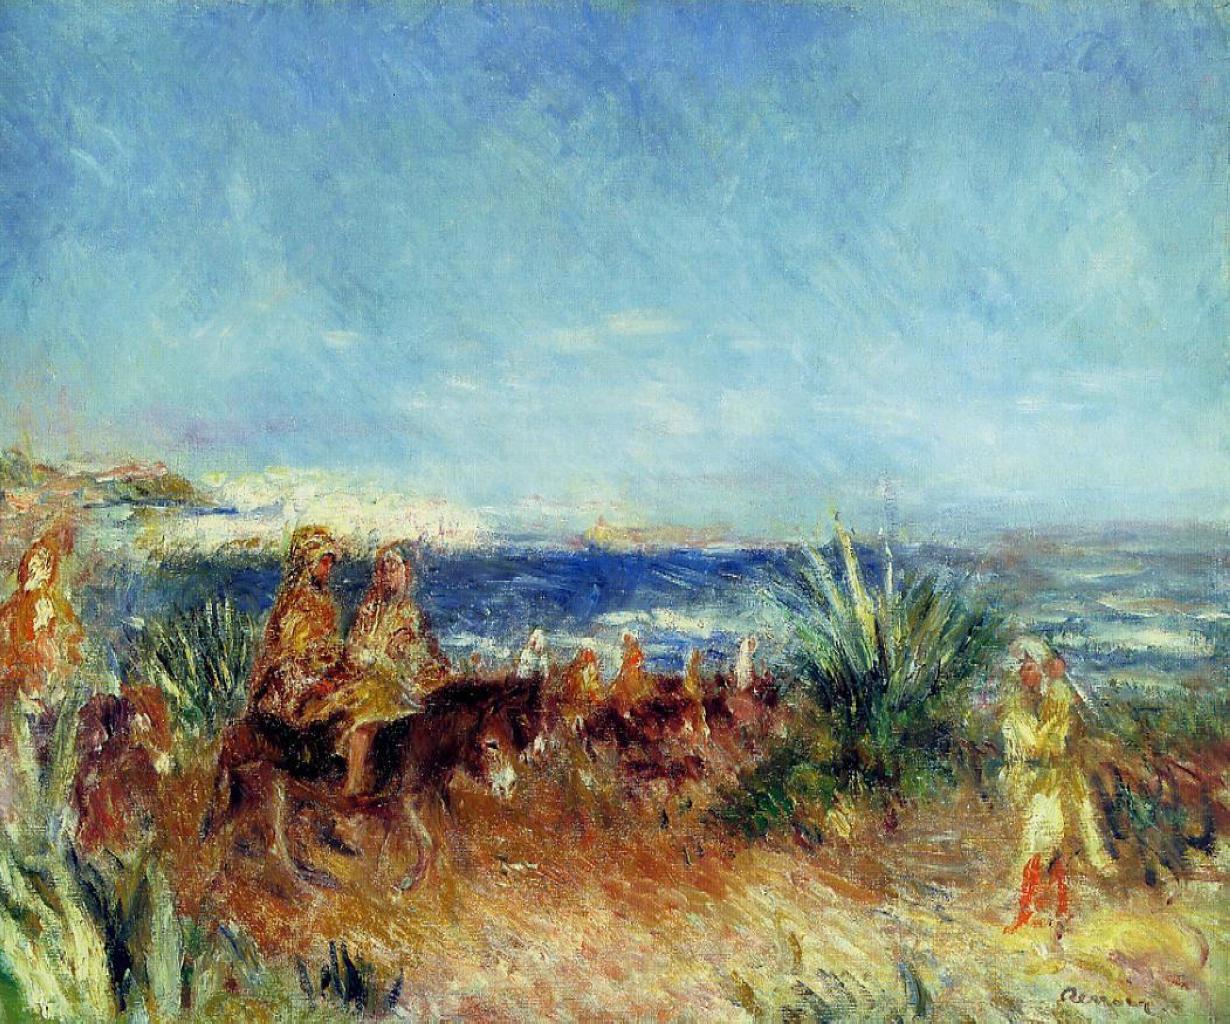 Pierre auguste renoir impressionist painter tutt 39 art for Paintings by renoir